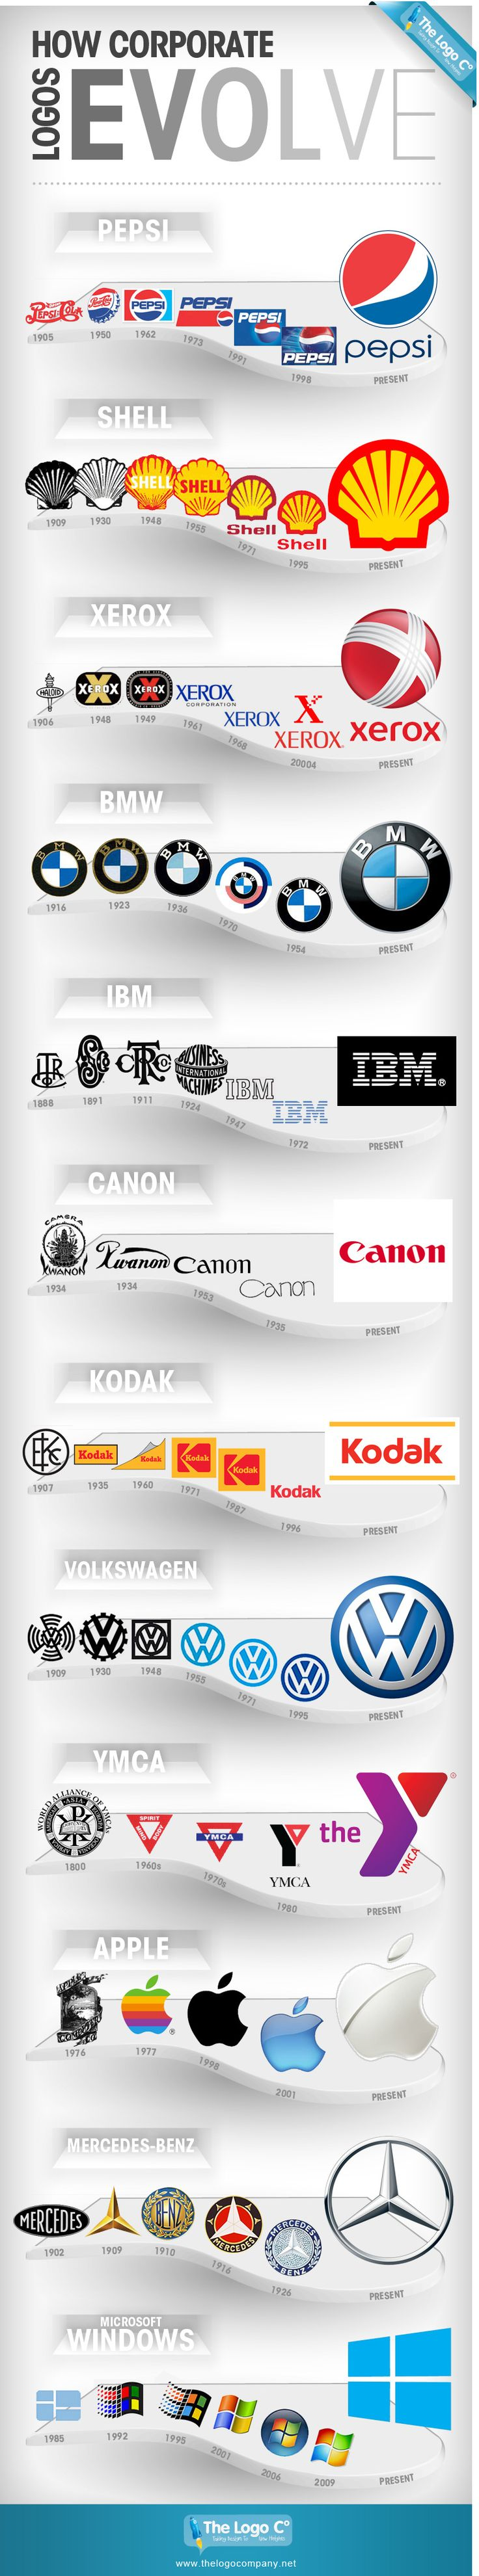 How Corporate Logos Changed Over the Years - Infographic - Pepsi, Shell, Xerox, BMW, IBM, Canon, Kodak, Volkswagen, YMCA, Apple, Mercedes Benz, Microsoft Windows -